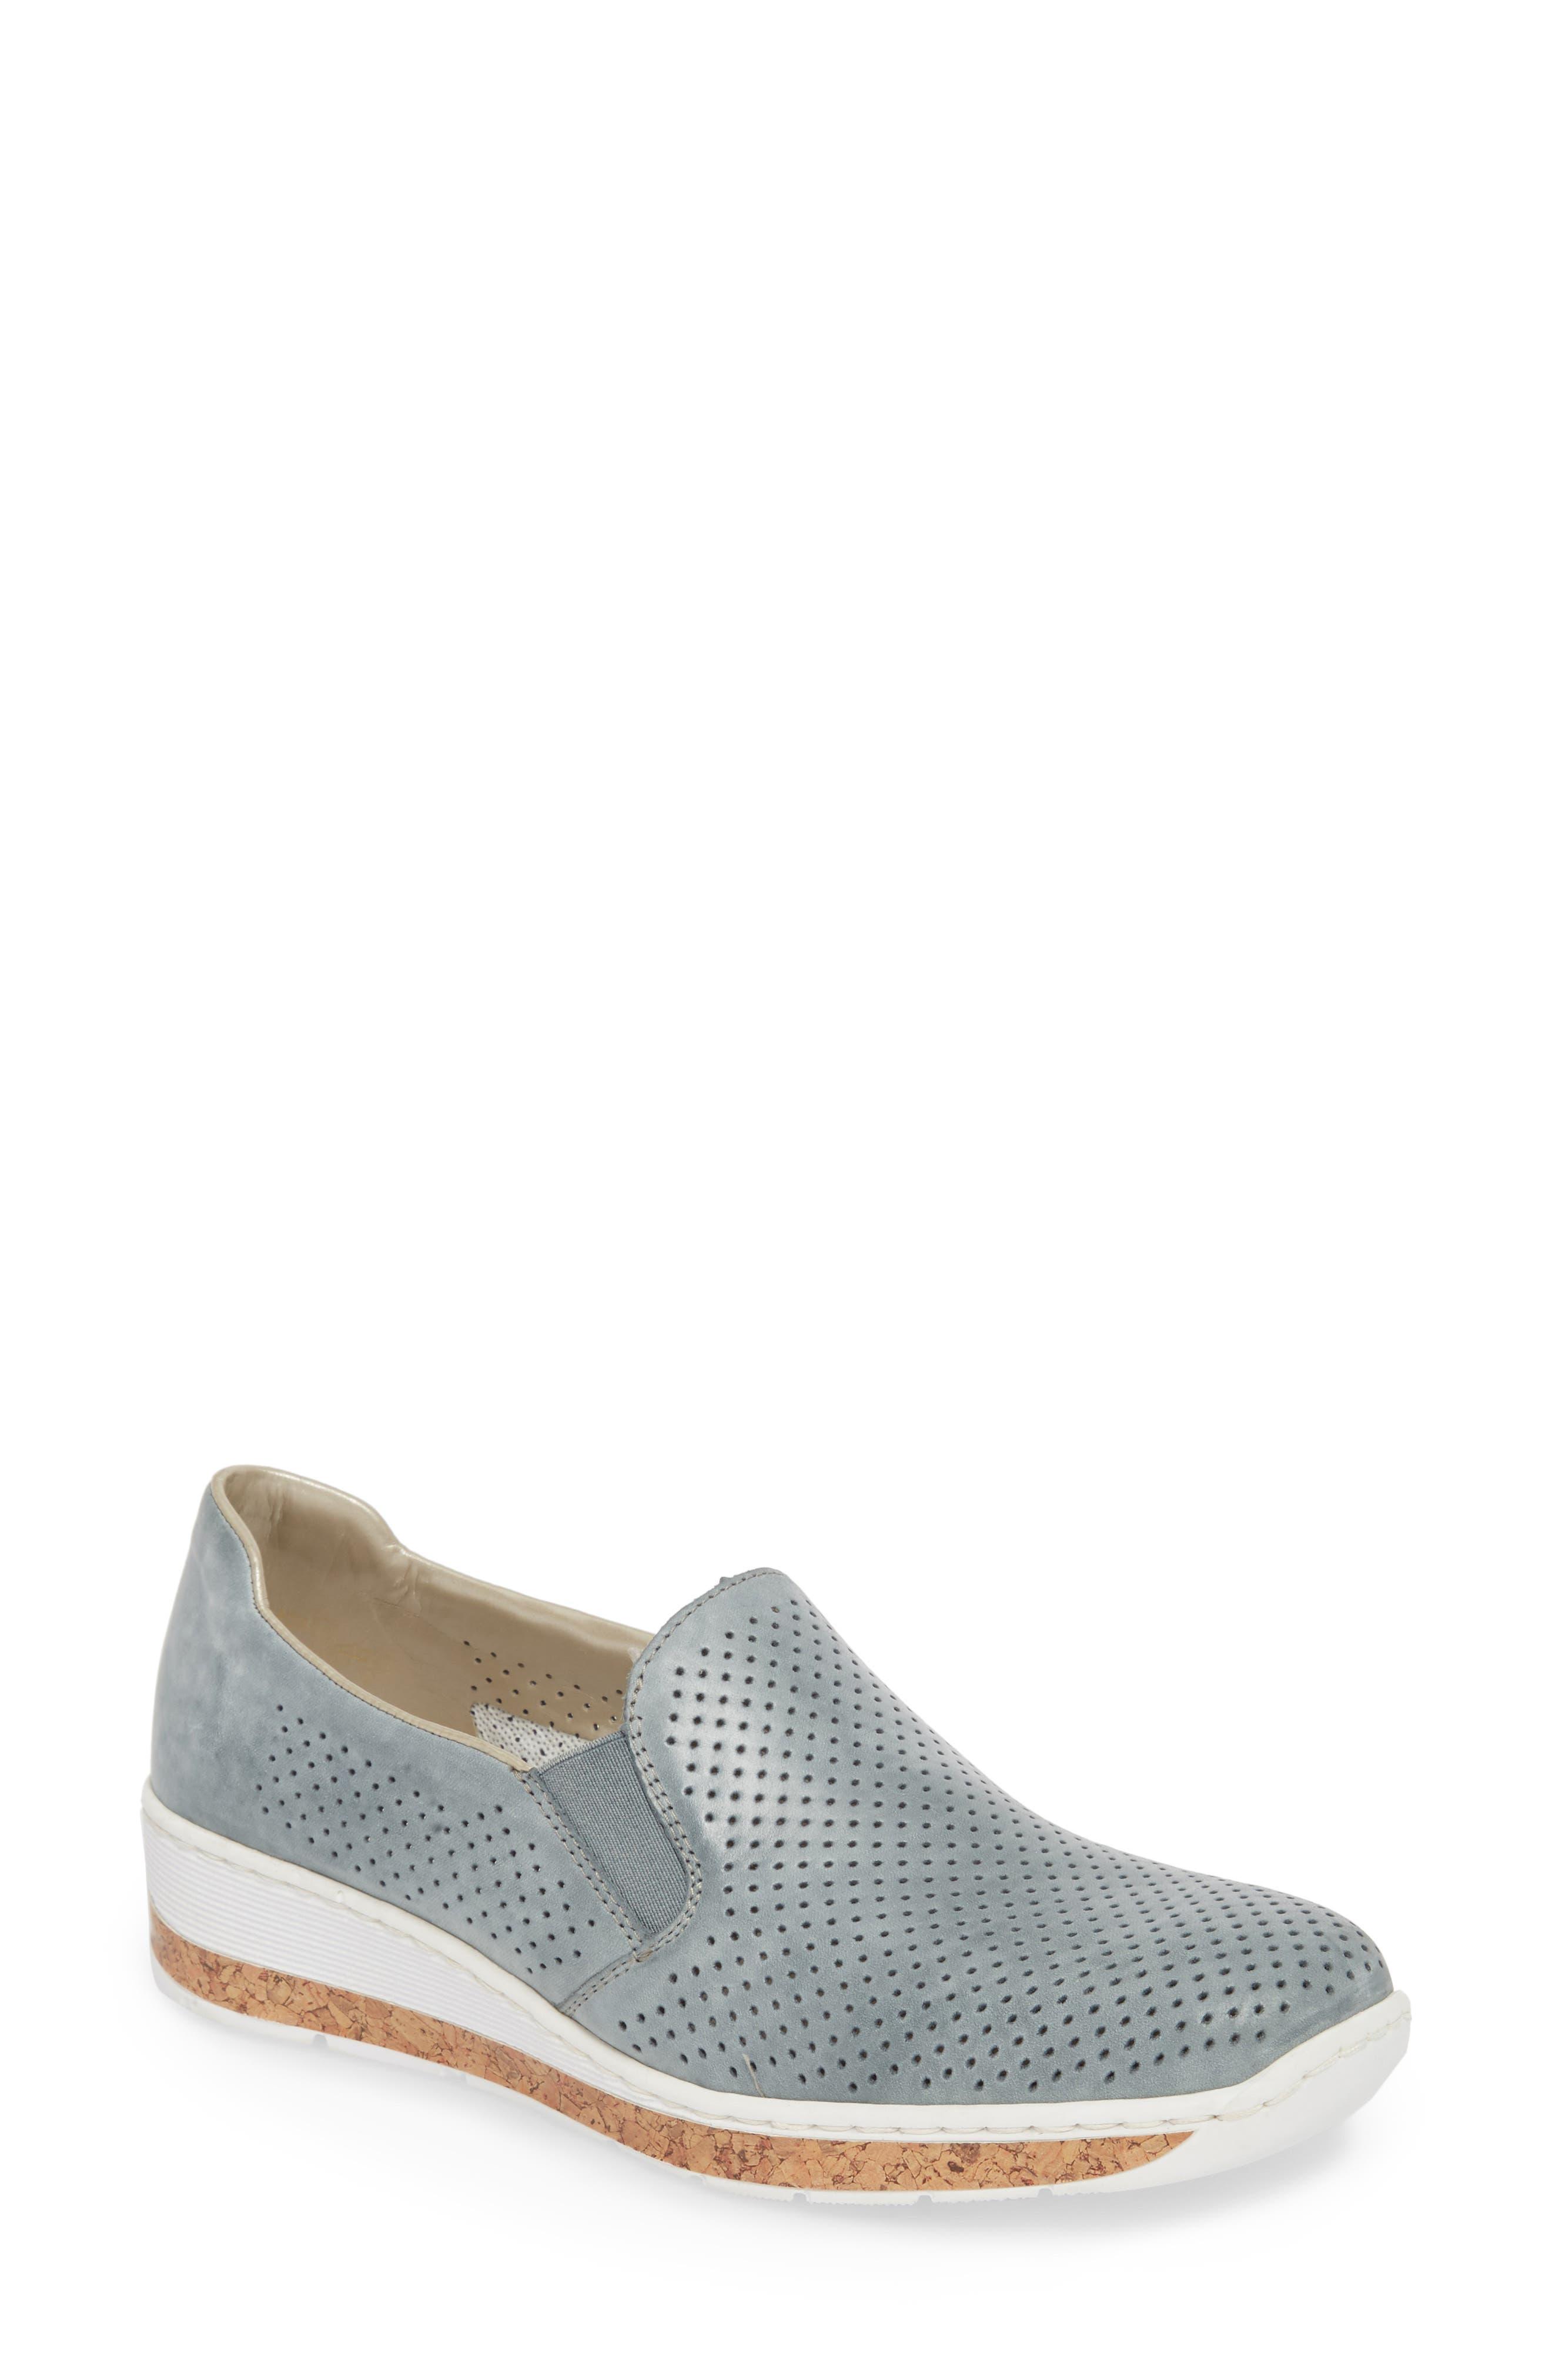 Doris 75 Wedge Sneaker,                             Main thumbnail 1, color,                             Royal Faux Leather